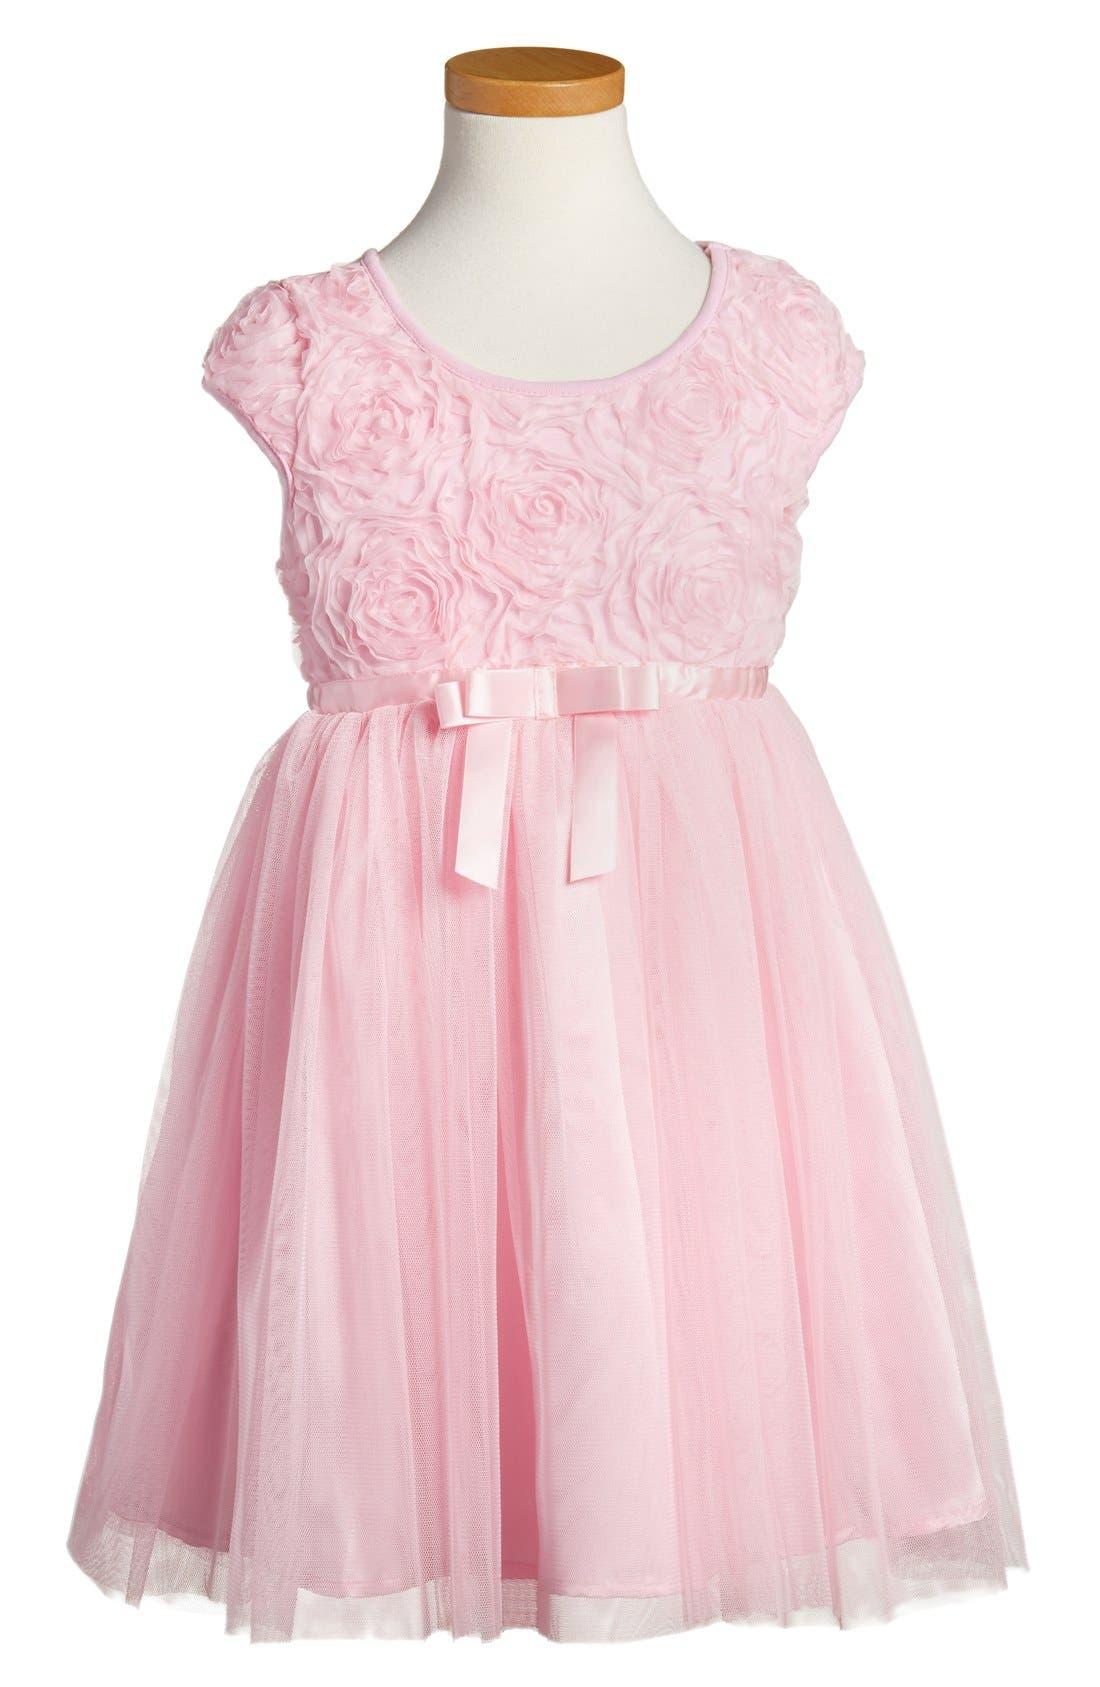 Ribbon Rosette Tulle Dress,                         Main,                         color, Pink